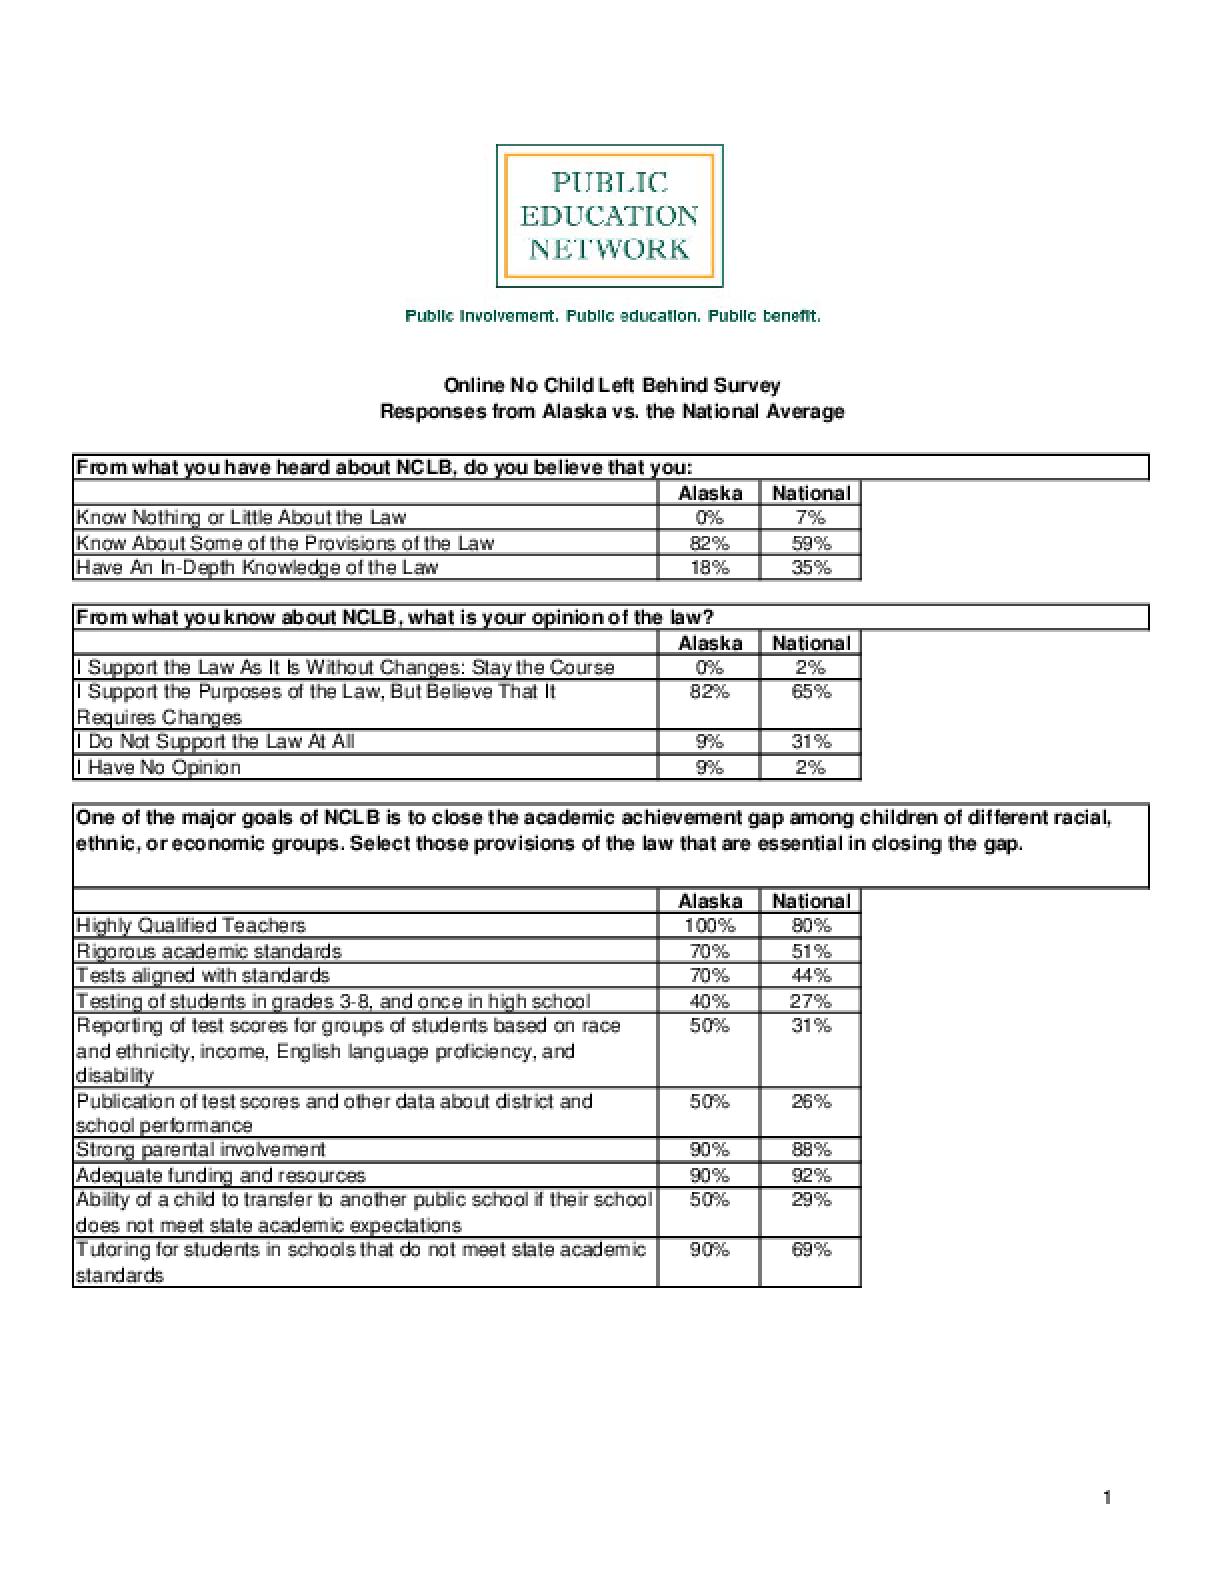 Online No Child Left Behind Survey Responses from Alaska vs. the National Average